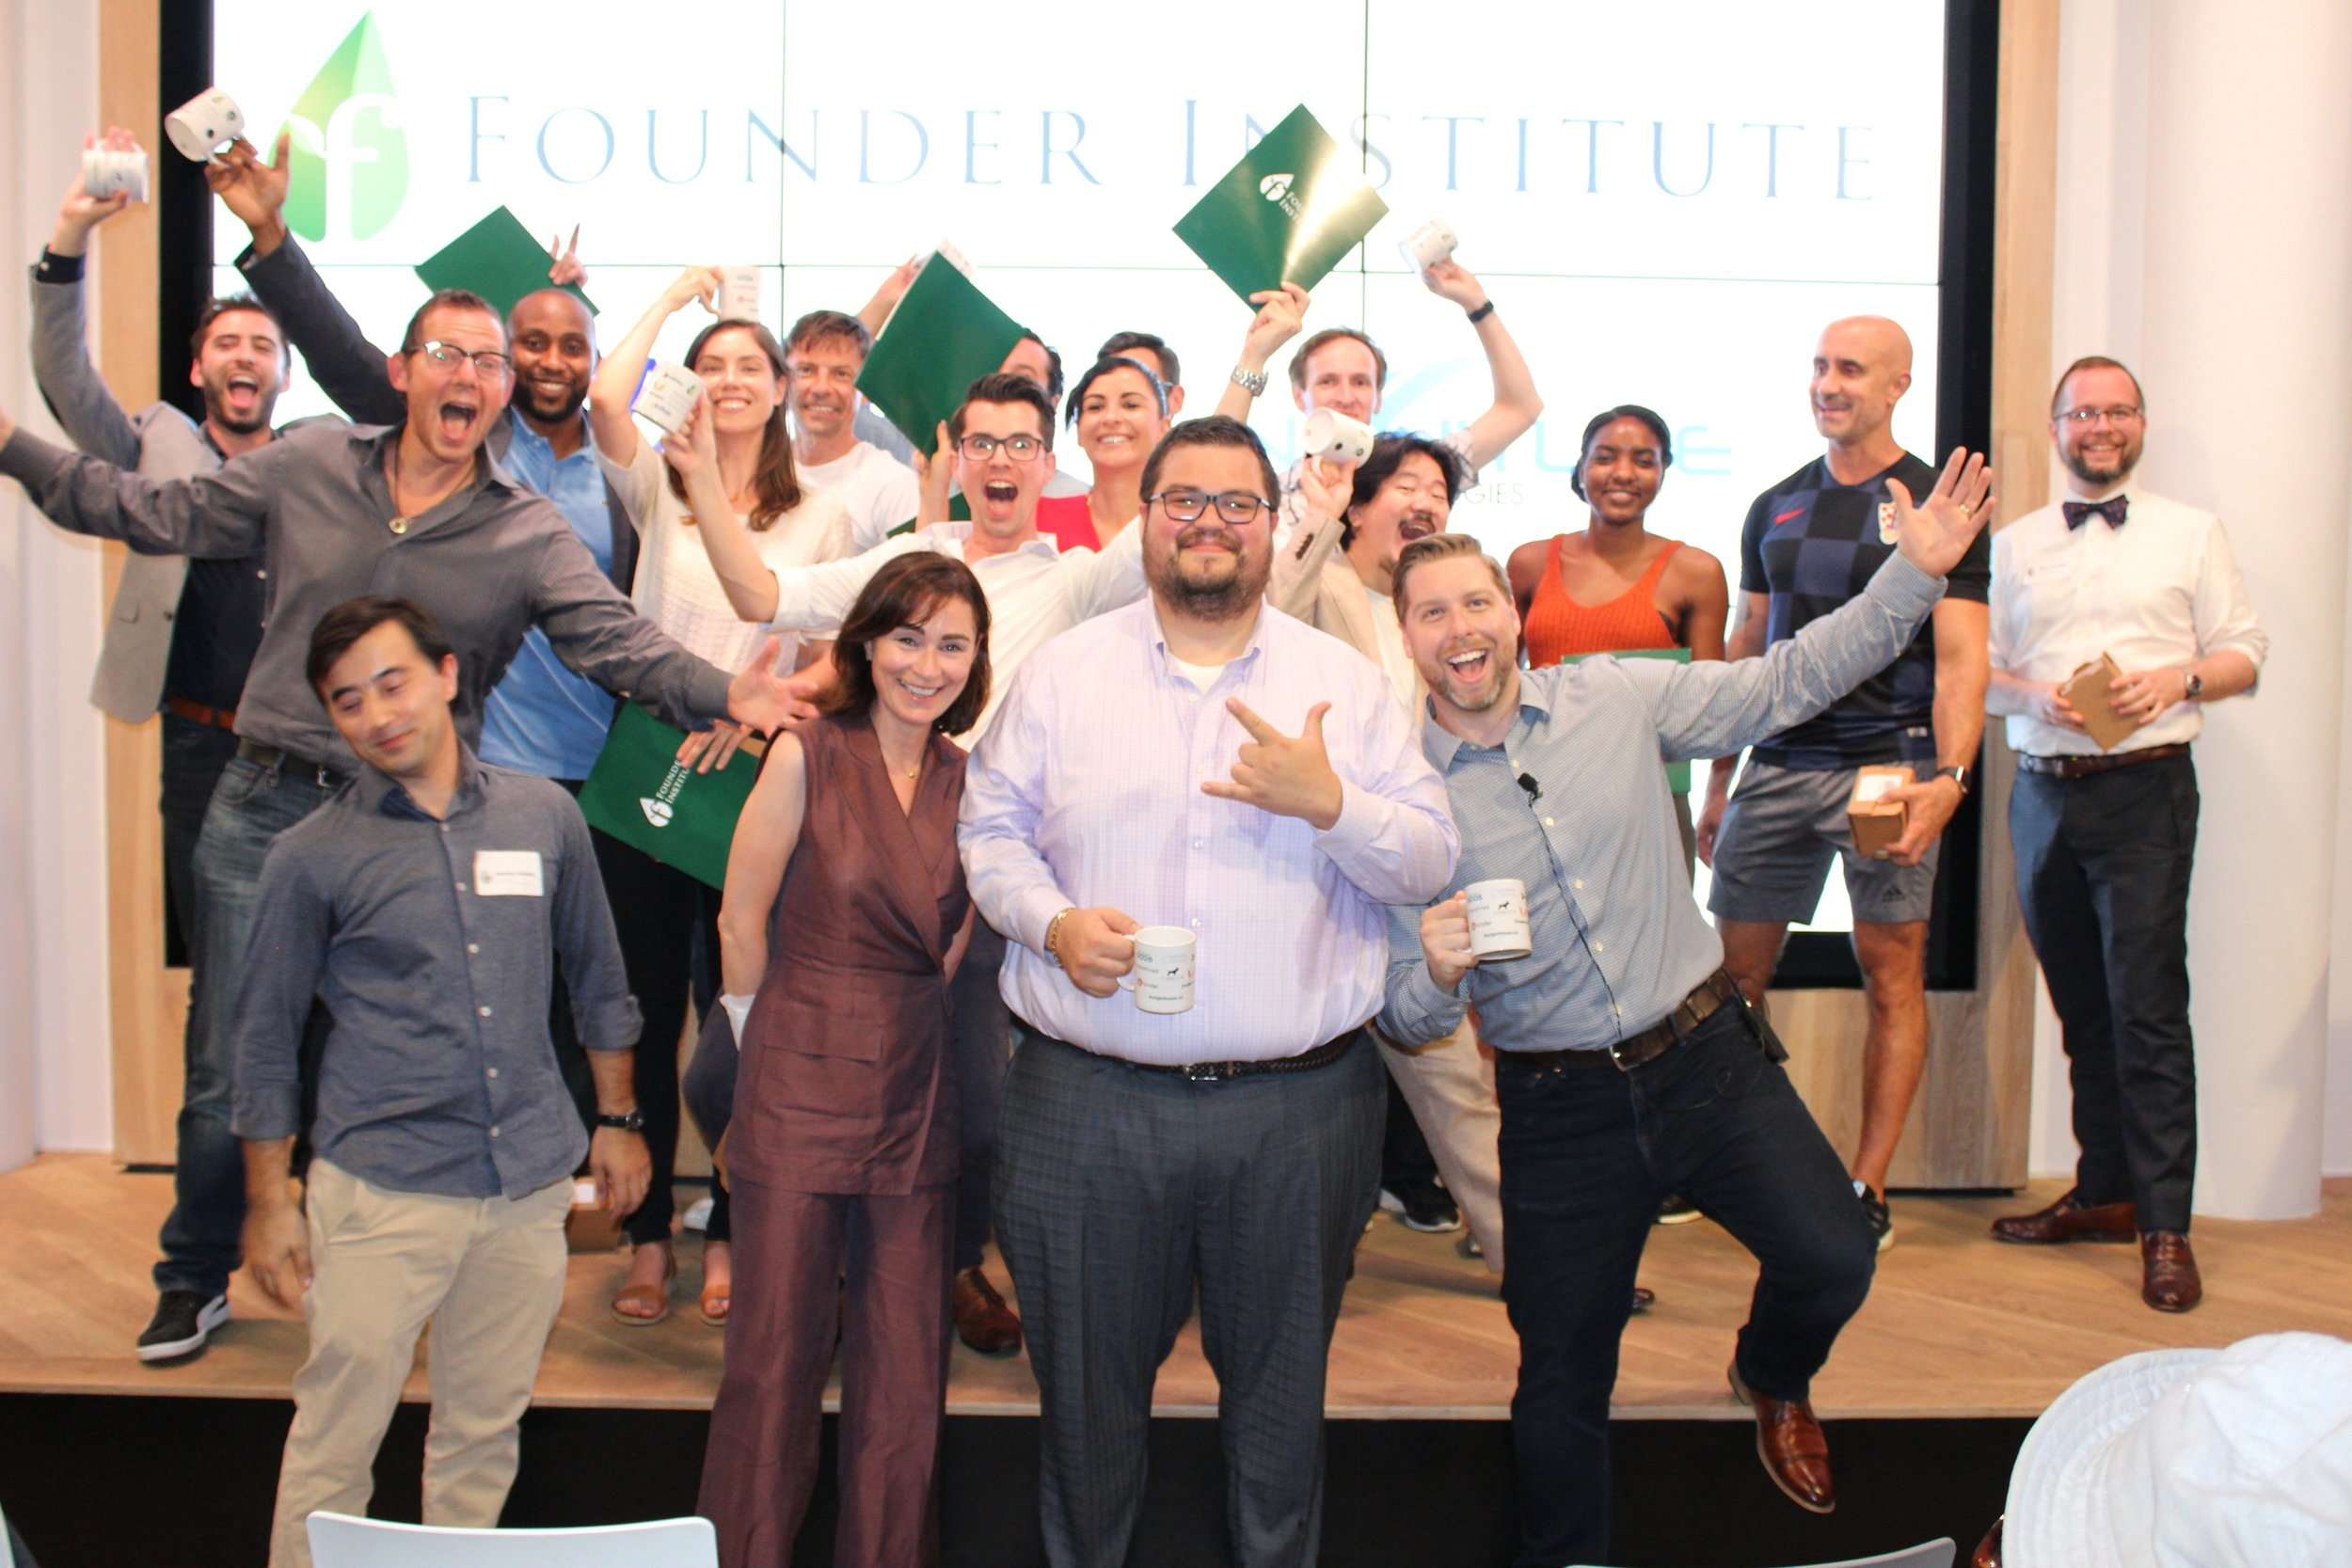 Founder Institute New York